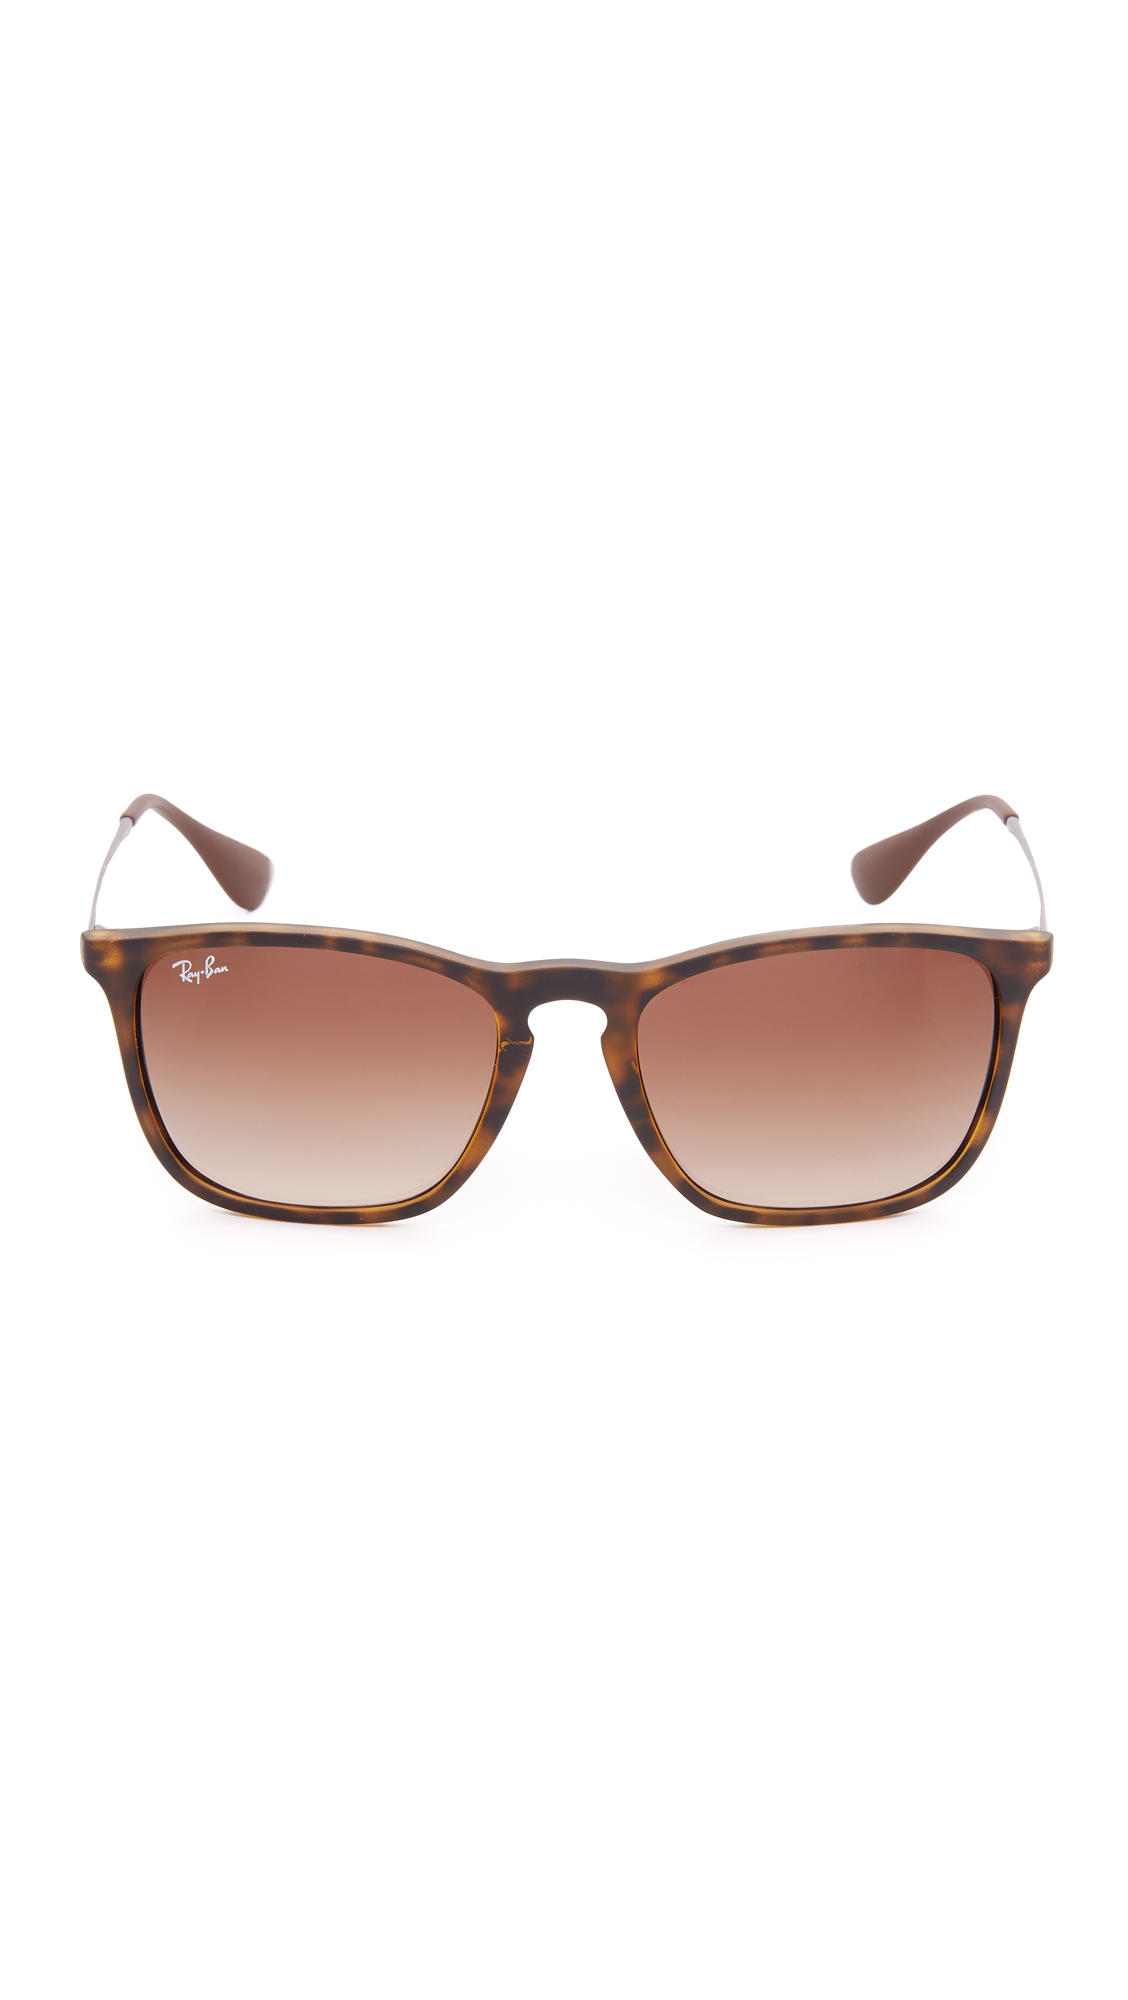 Ray ban sunglasses sale new zealand - Ray Ban Sunglasses Sale New Zealand 60